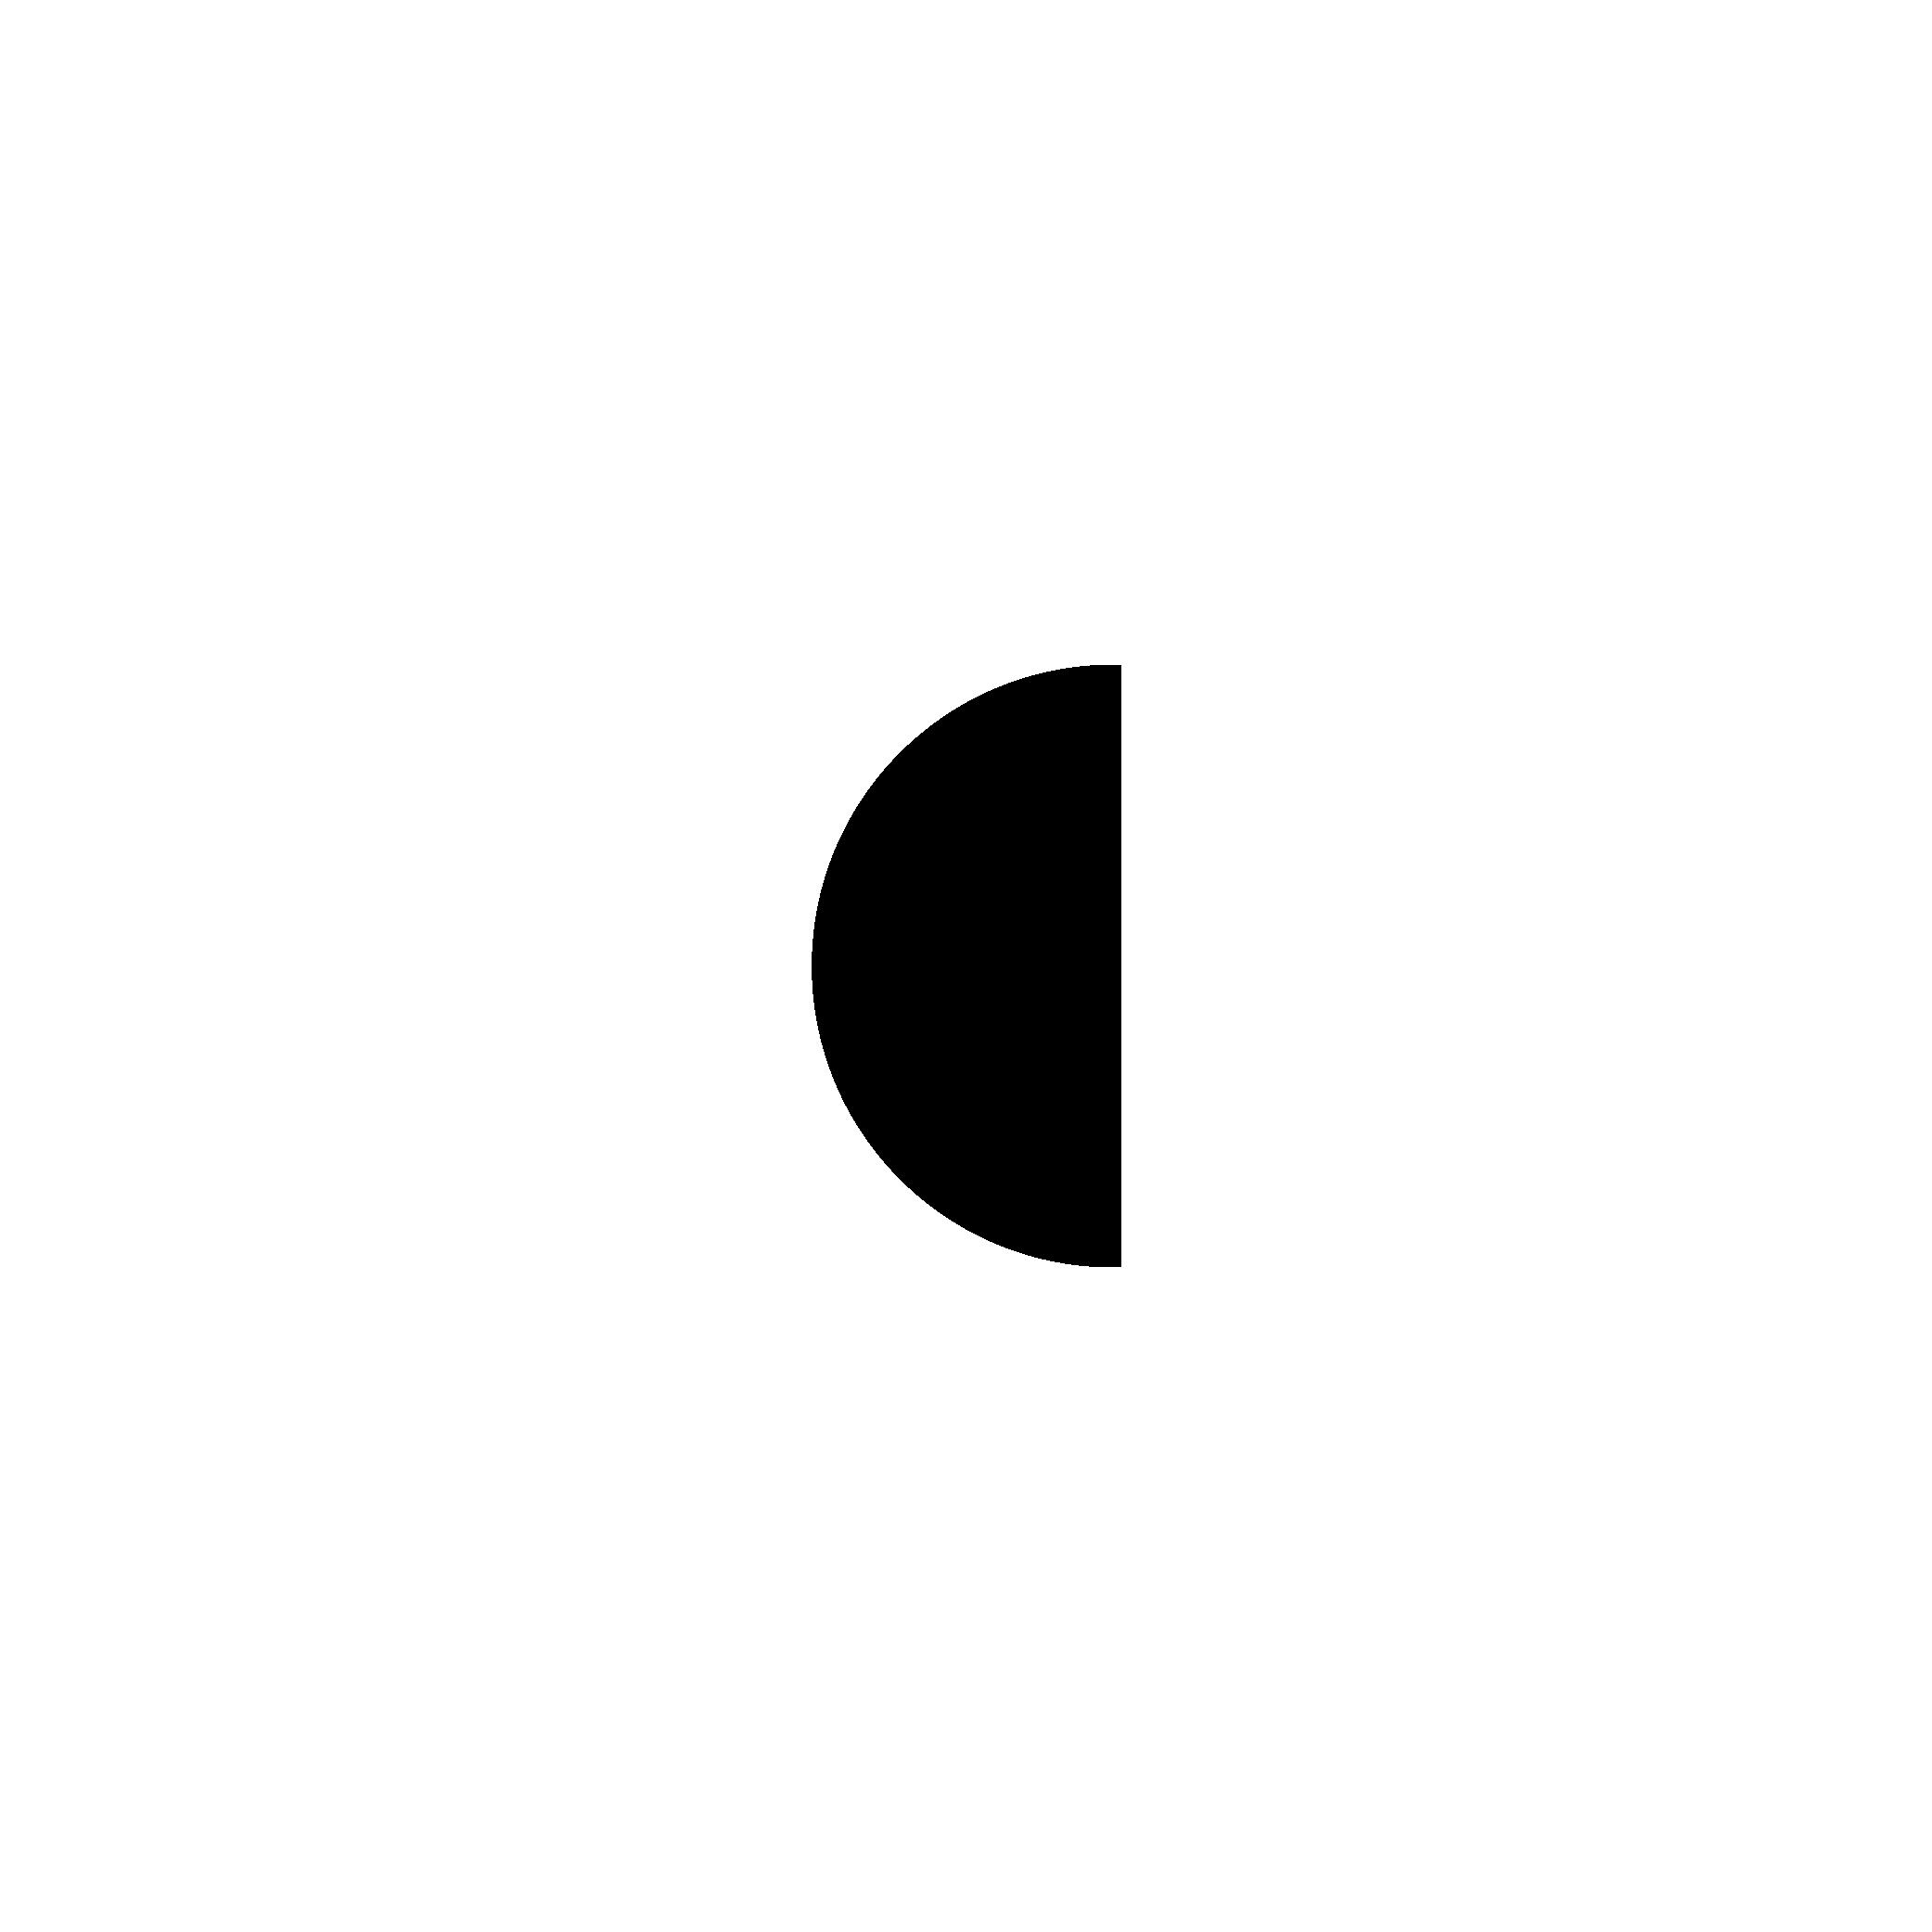 half_moon_otherside-01.png